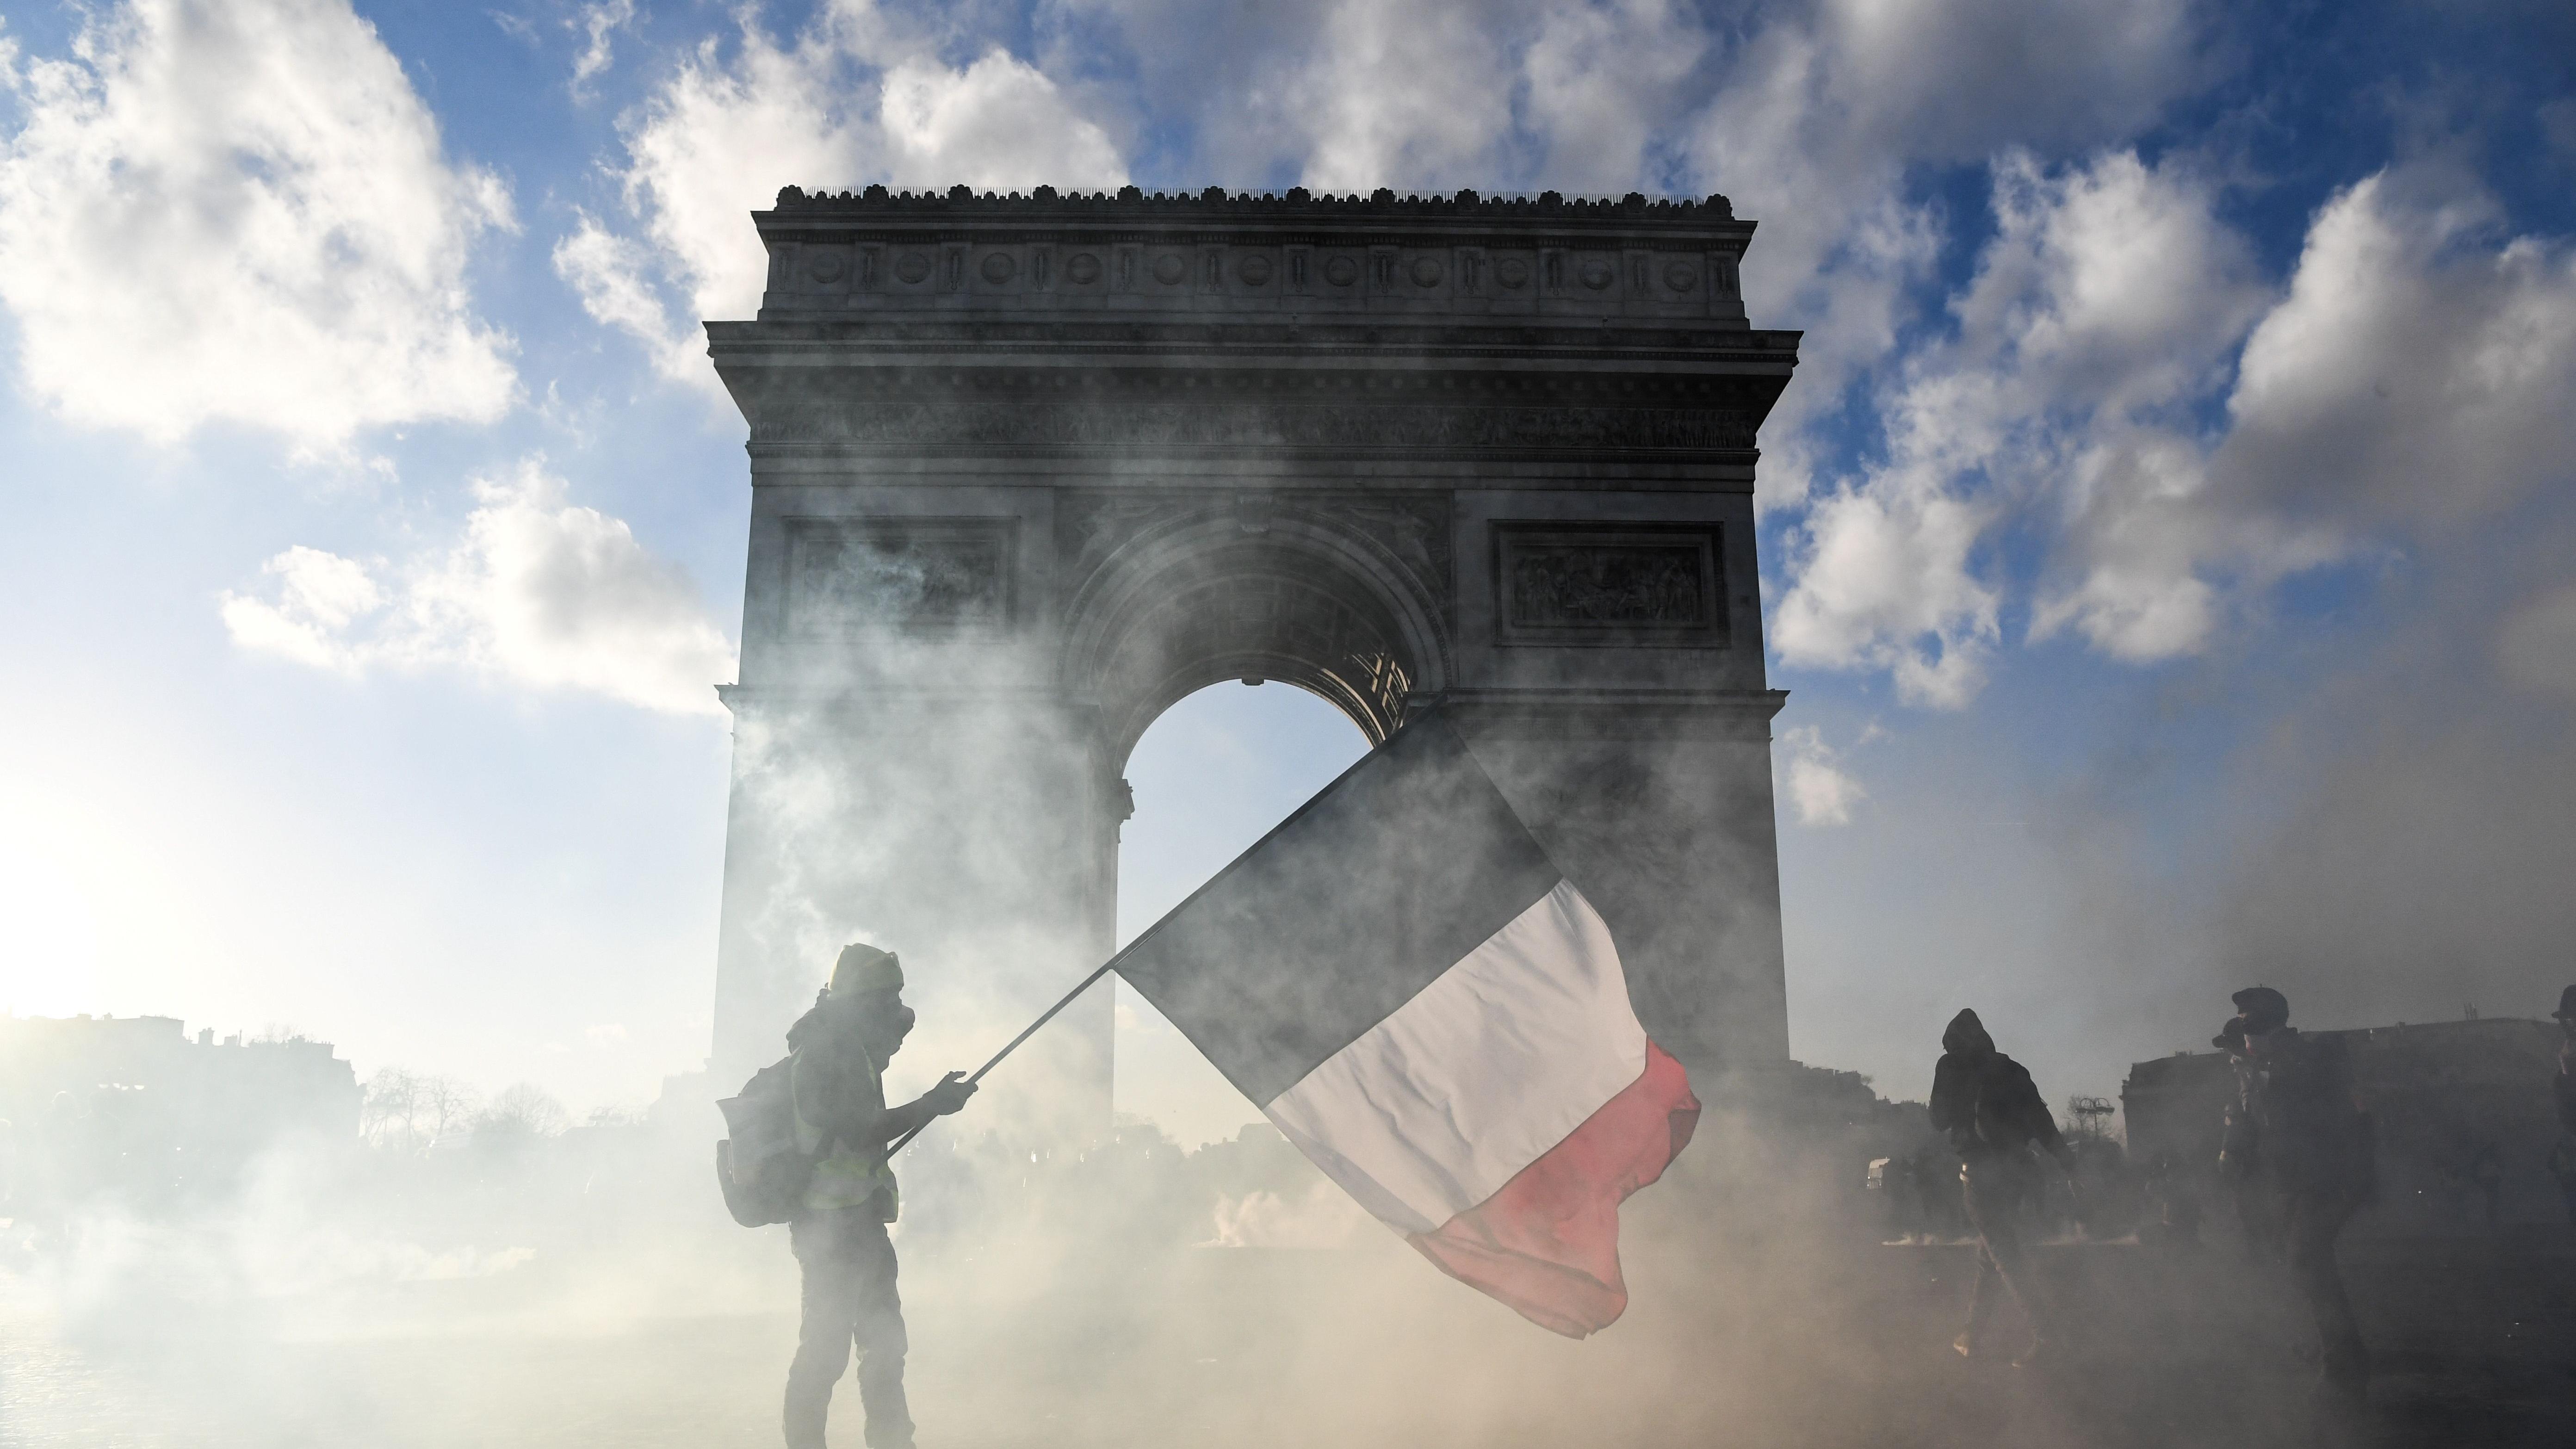 Paris verbietet Gelbwesten-Protest an bestimmten Orten